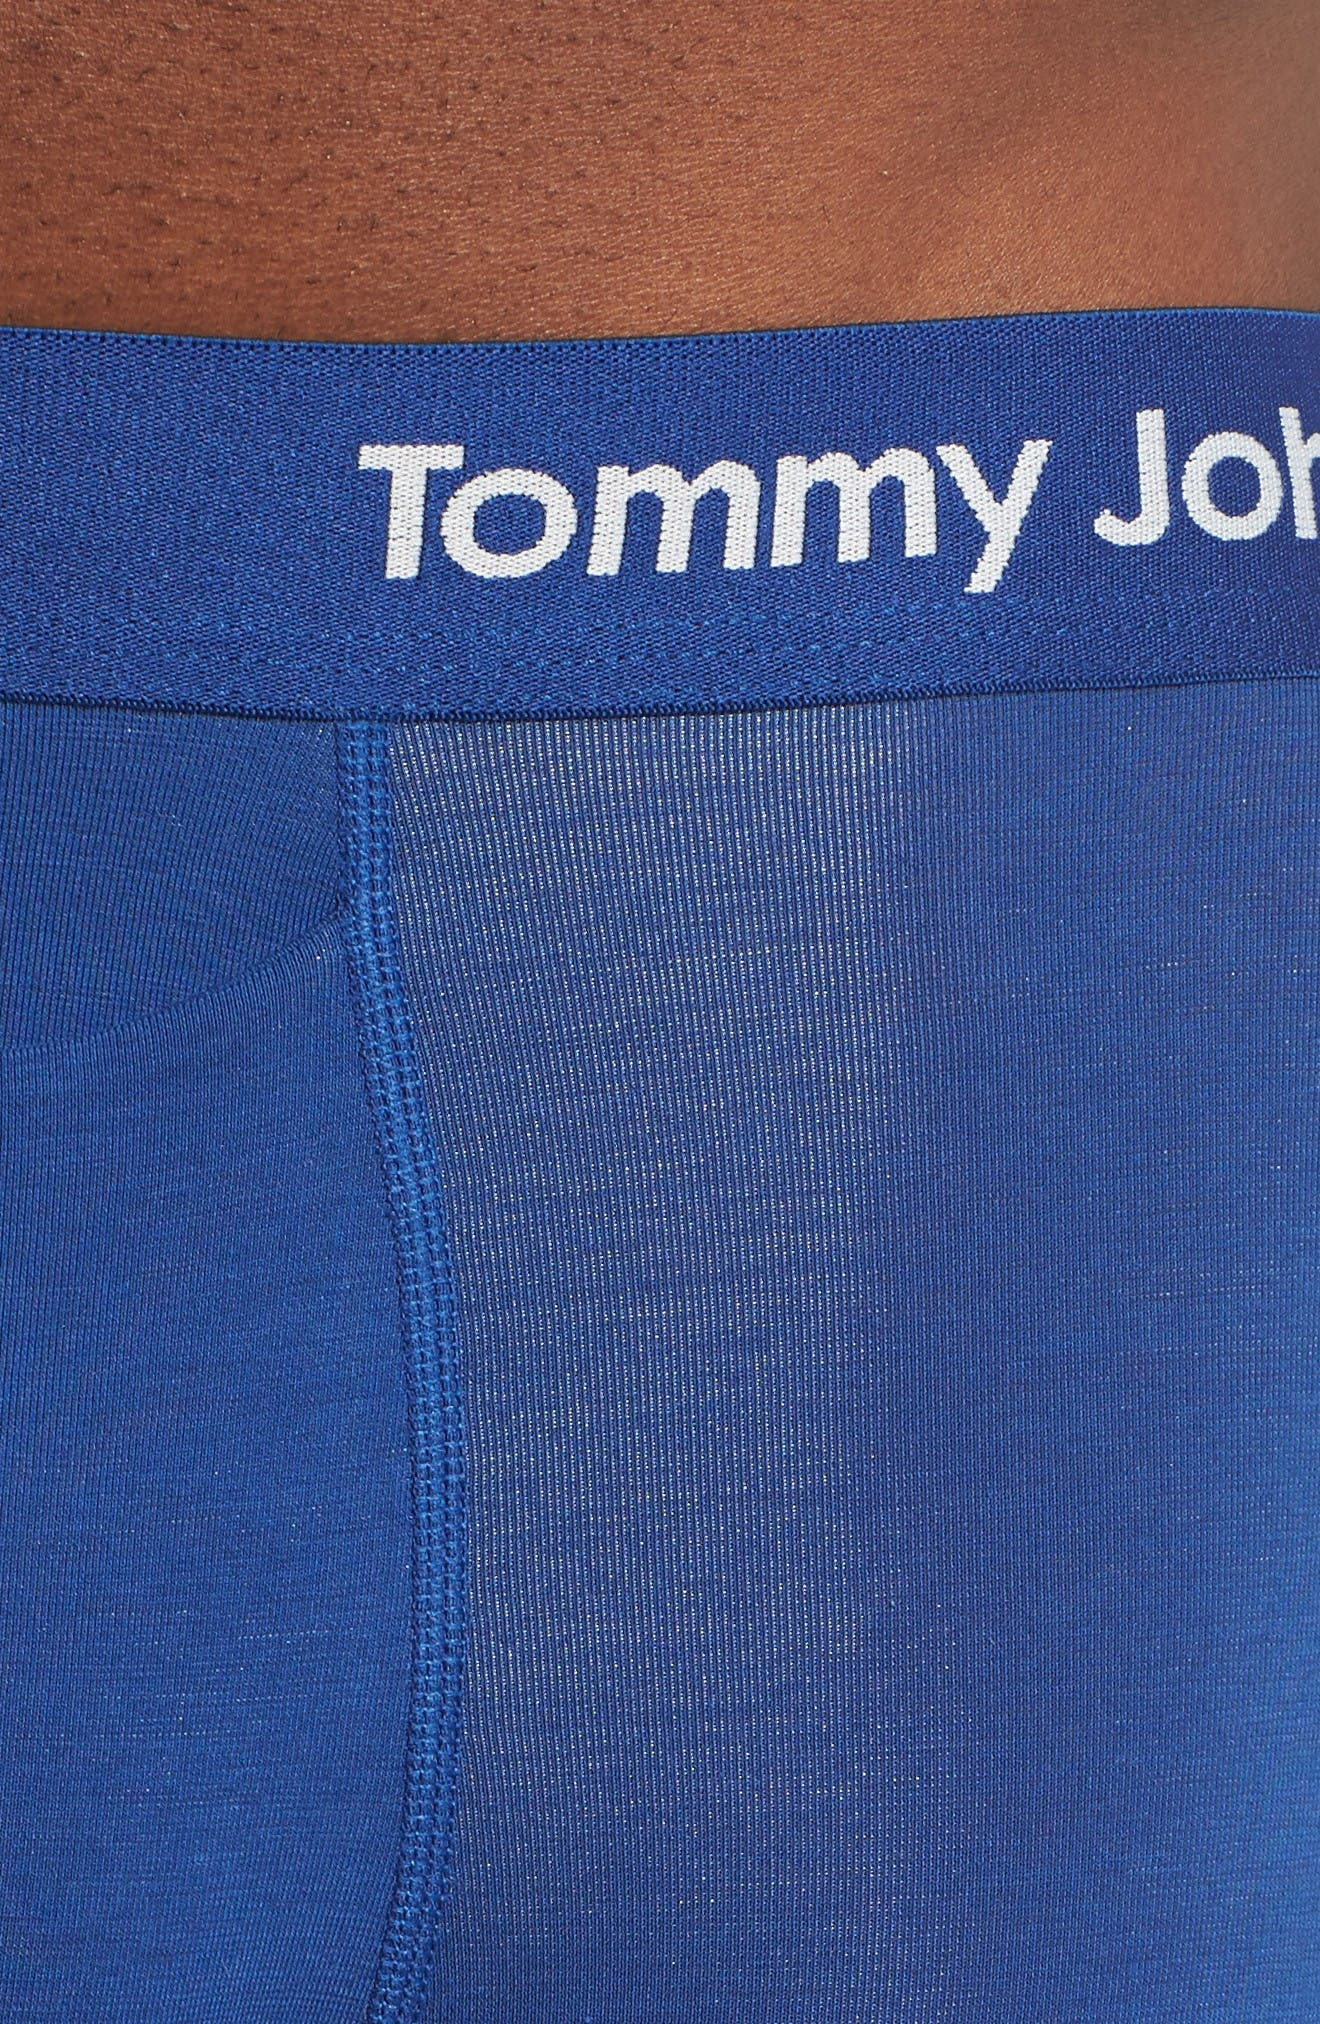 Alternate Image 4  - Tommy John Cool Cotton Boxer Briefs